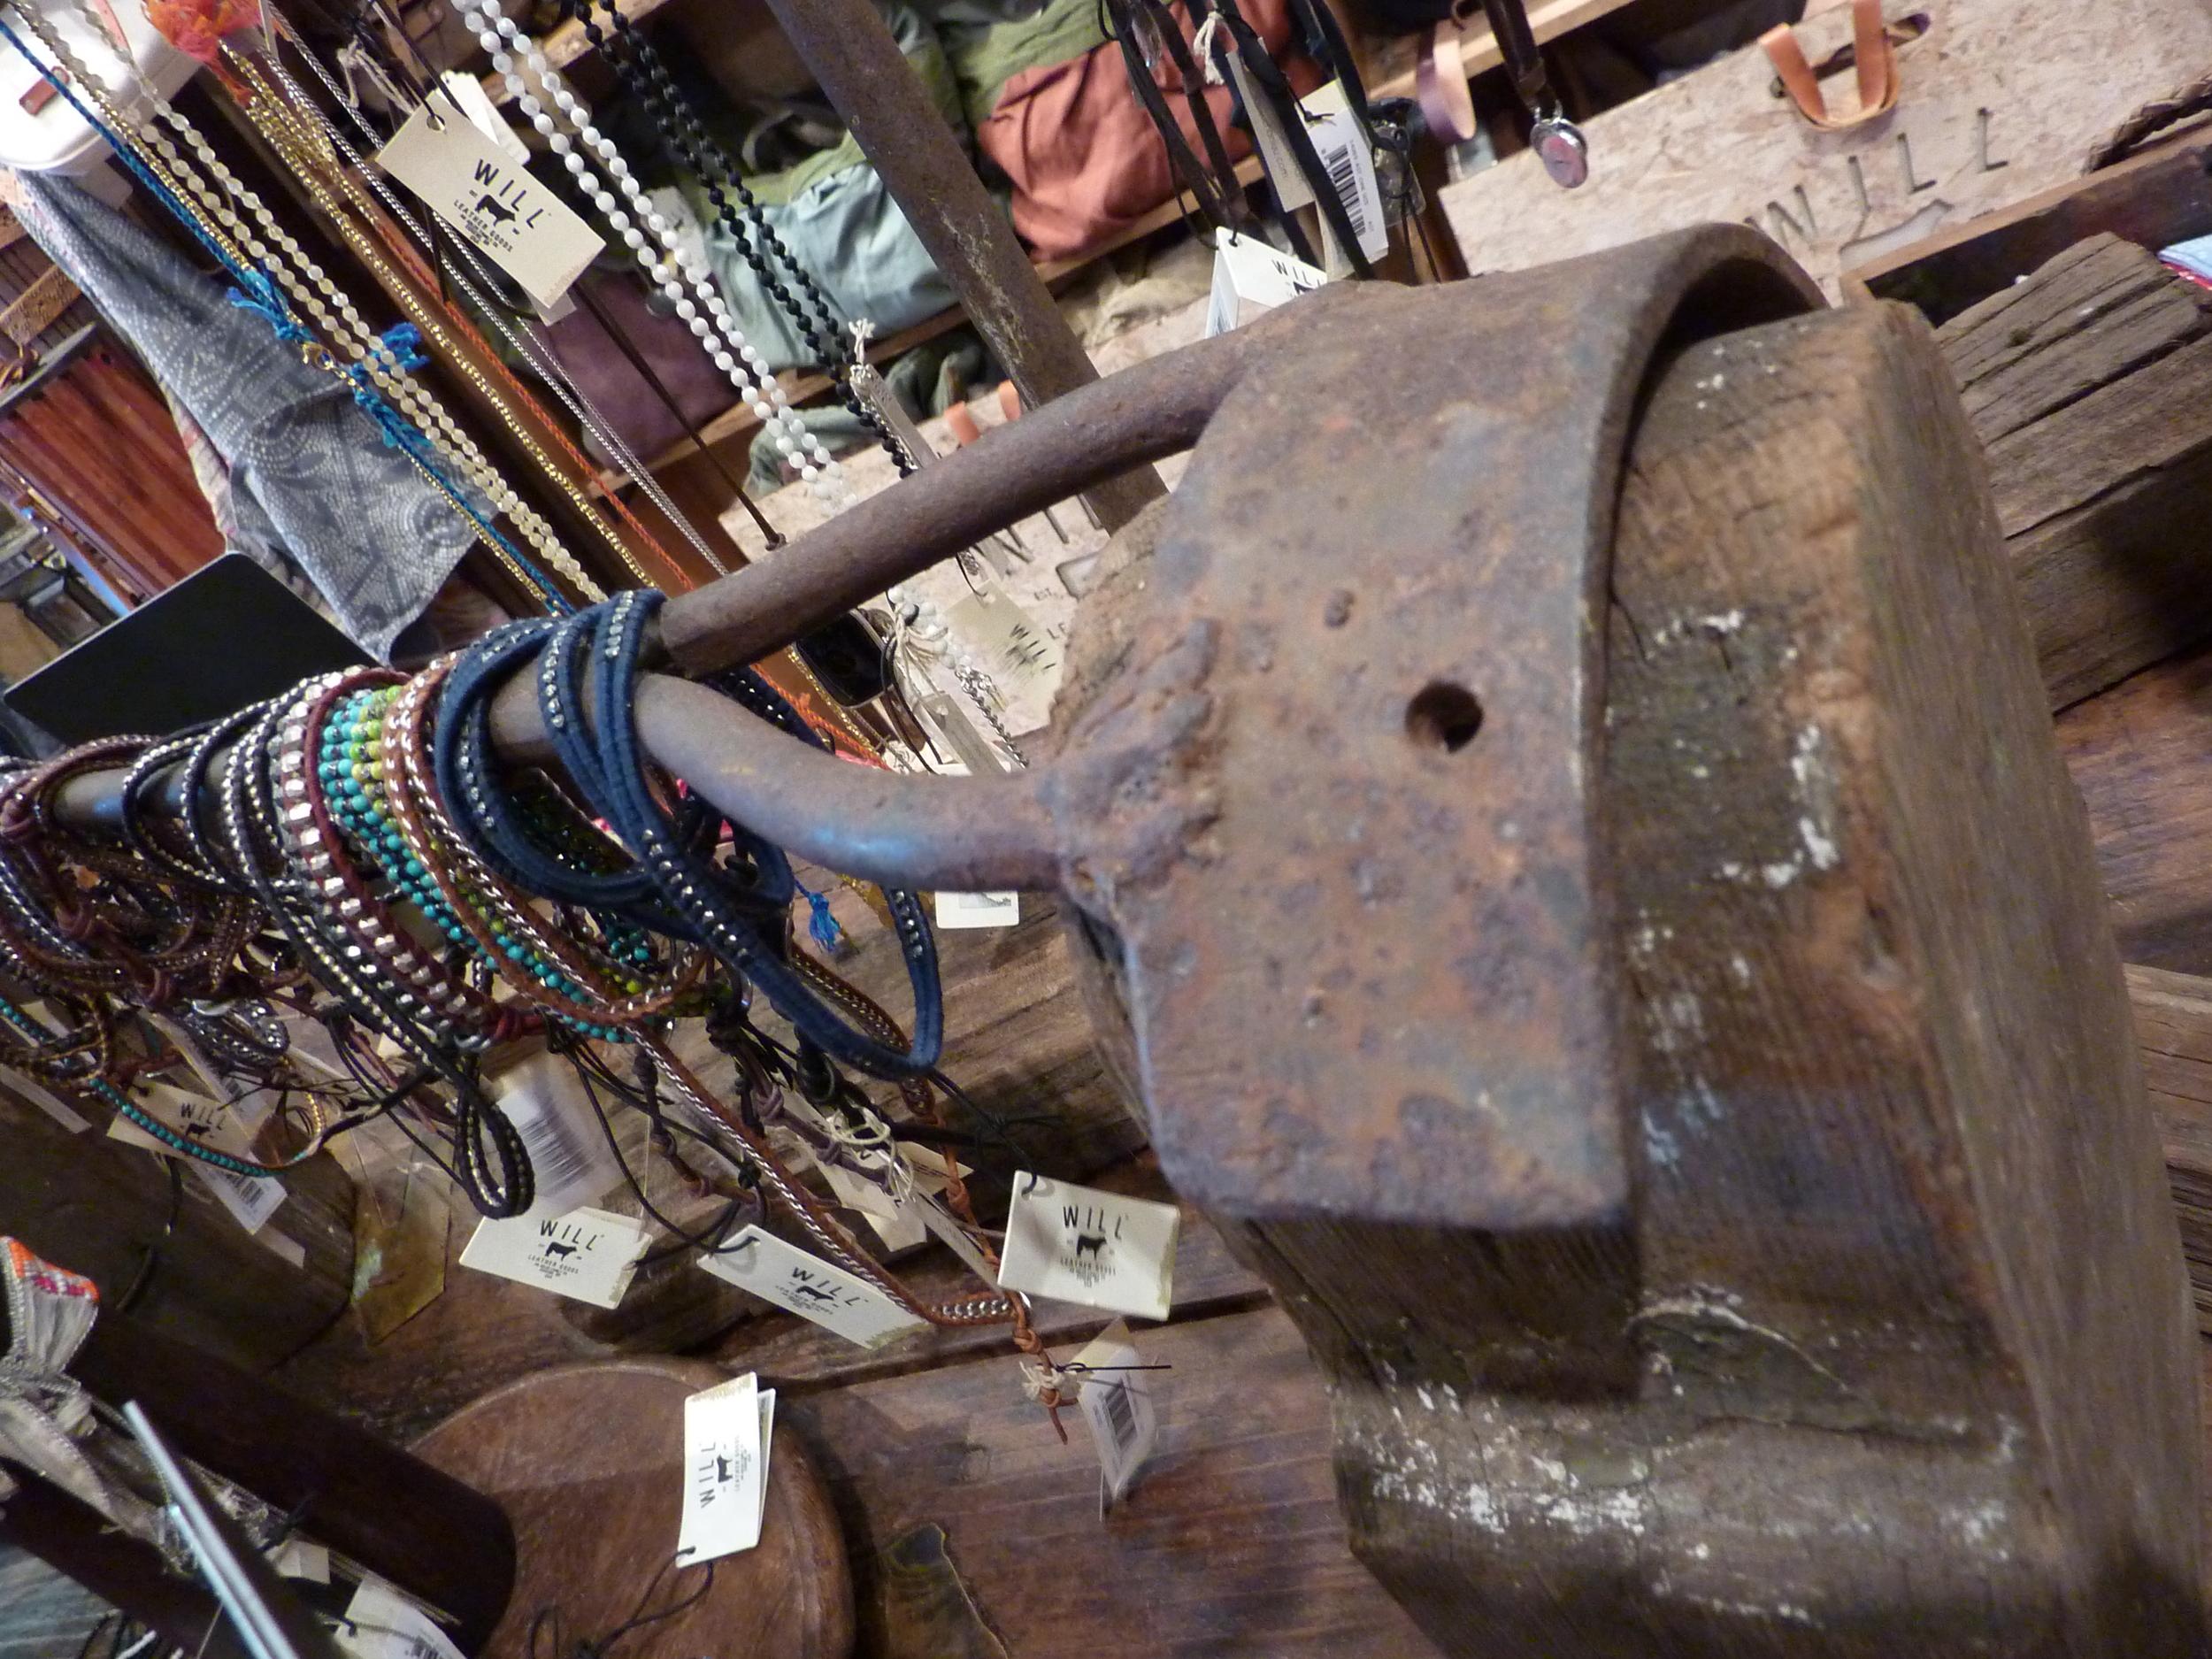 photo | branding iron jewelry fixture